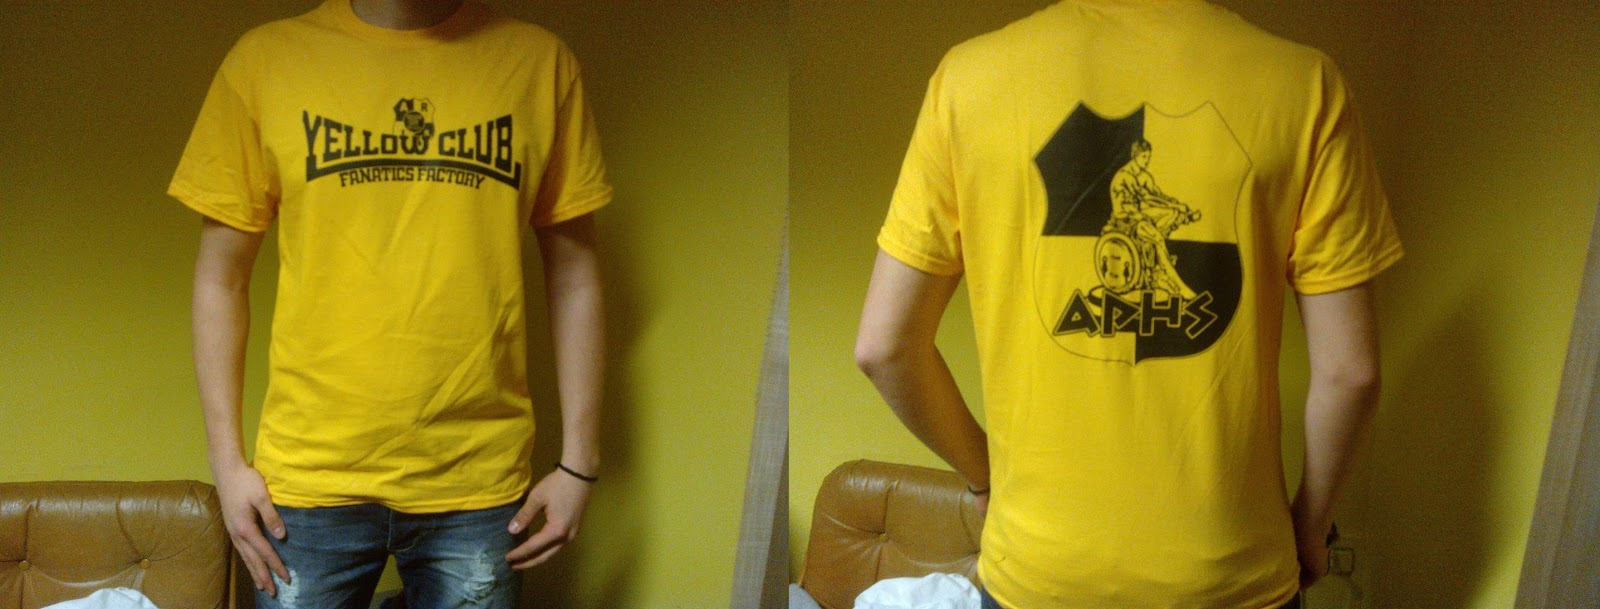 fcf67f761259 https   www.facebook.com pages ARIS-Yellow-Club 281136205411576 fref ts